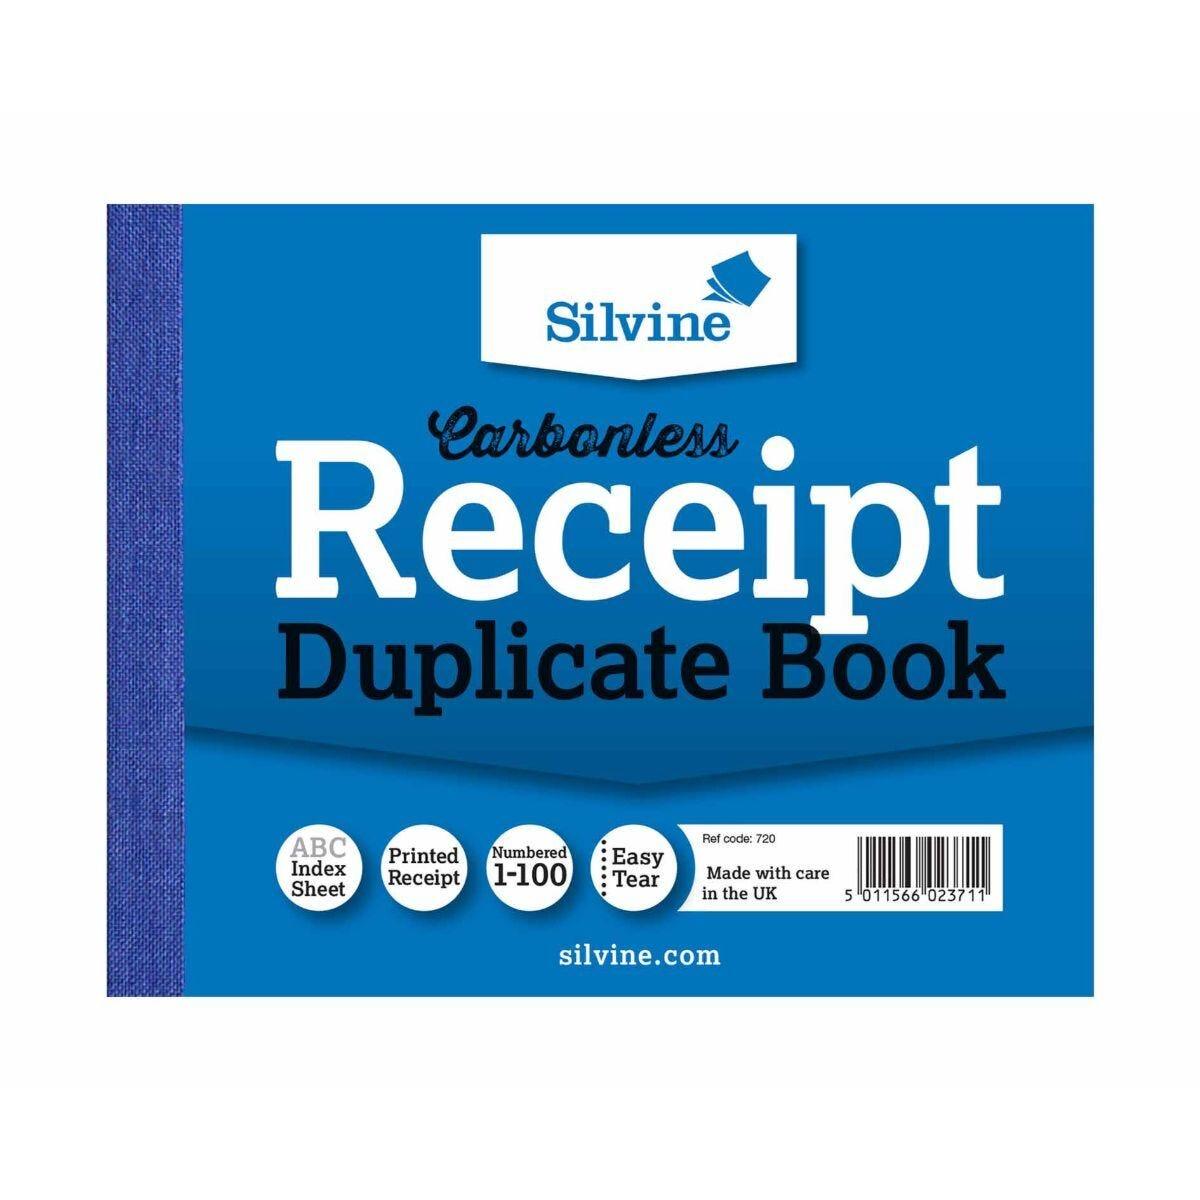 Silvine Carbonless Duplicate Receipt Book Pack of 12